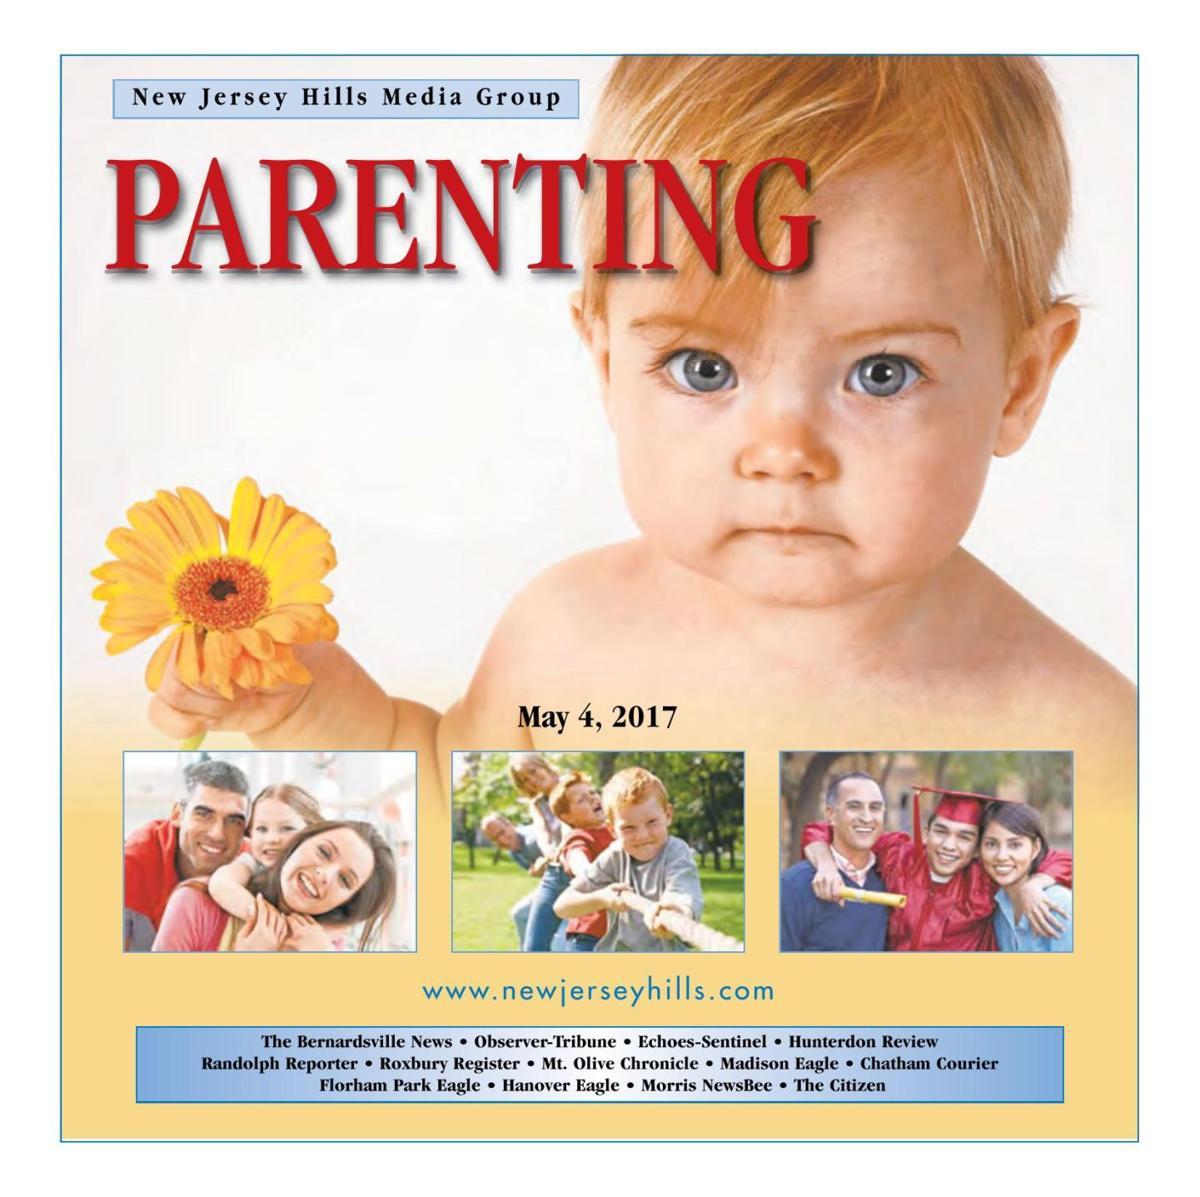 Parenting - May 4, 2017